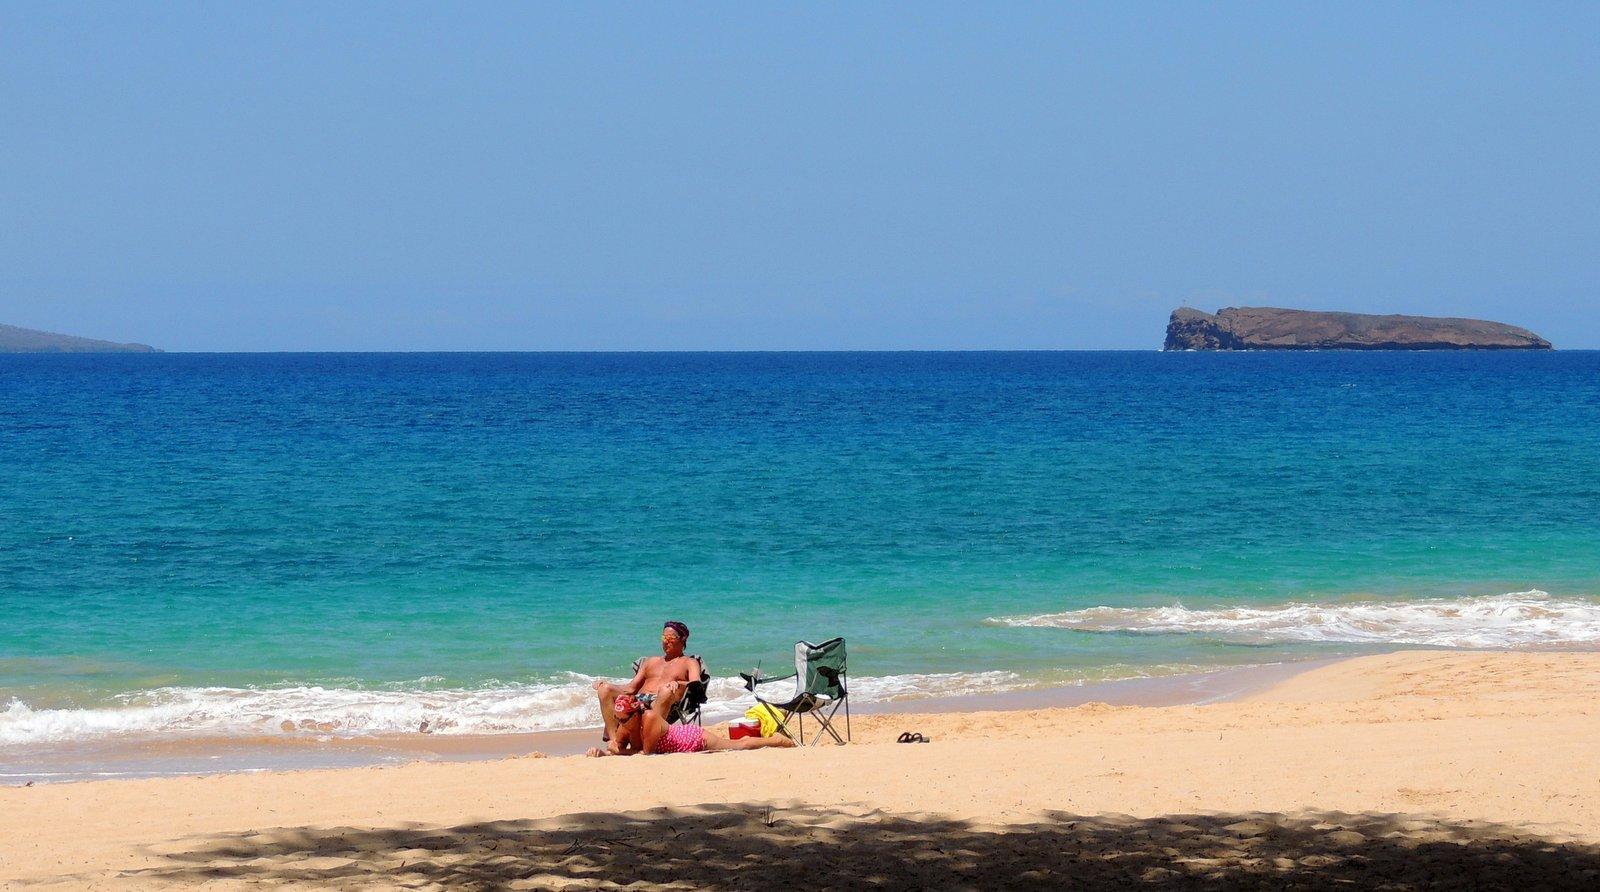 Maui - Makena Beach mit Blick auf die Insel Molokini